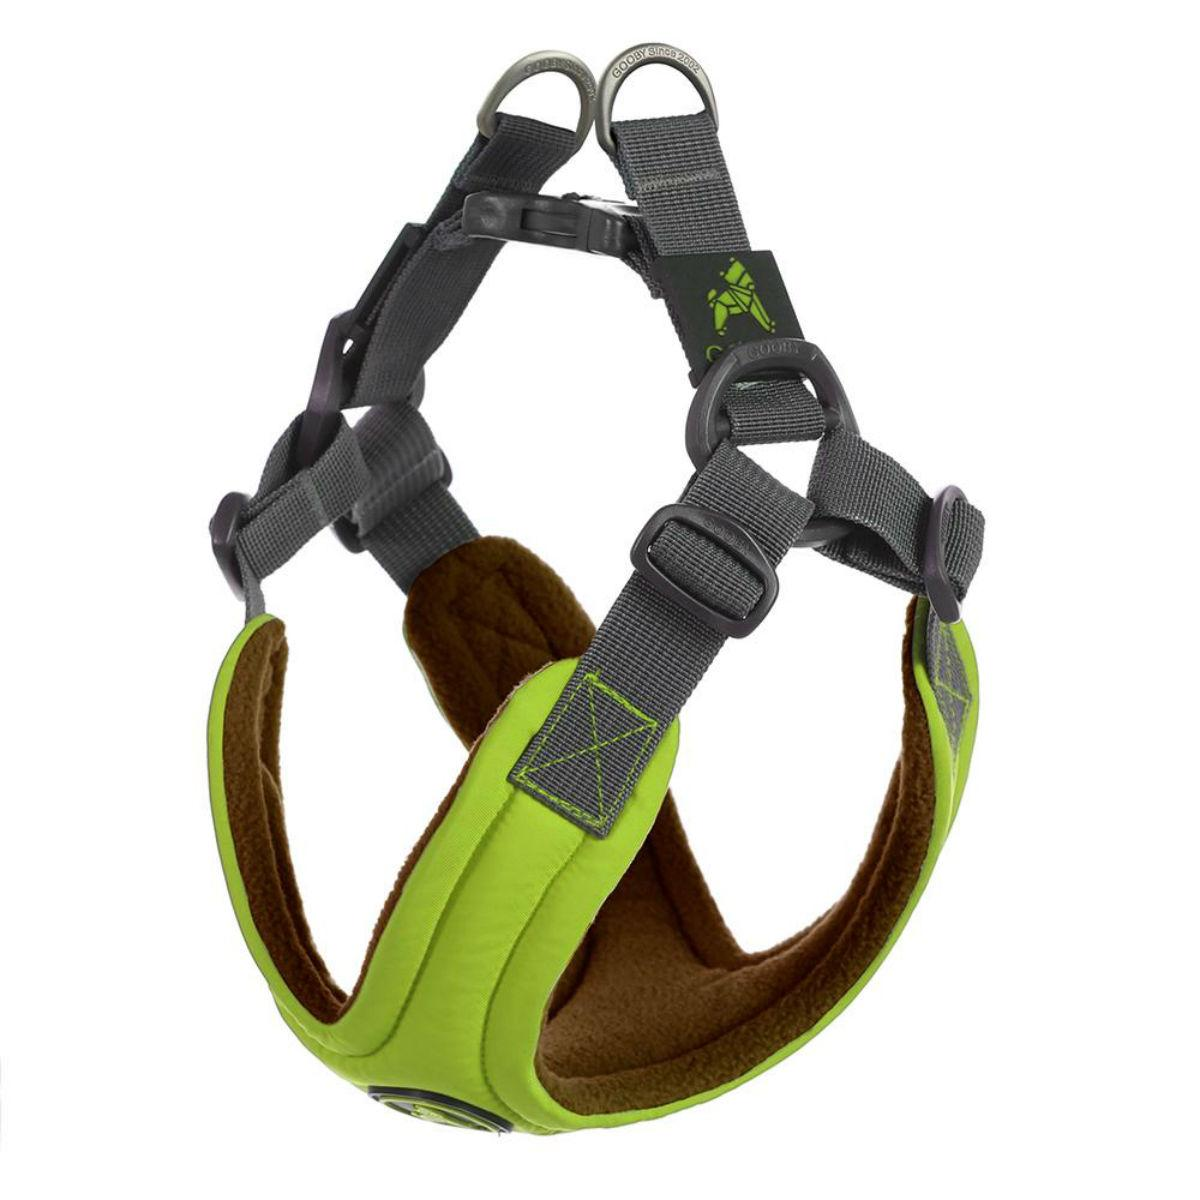 Gooby Escape Free Memory Foam Dog Harness - Green